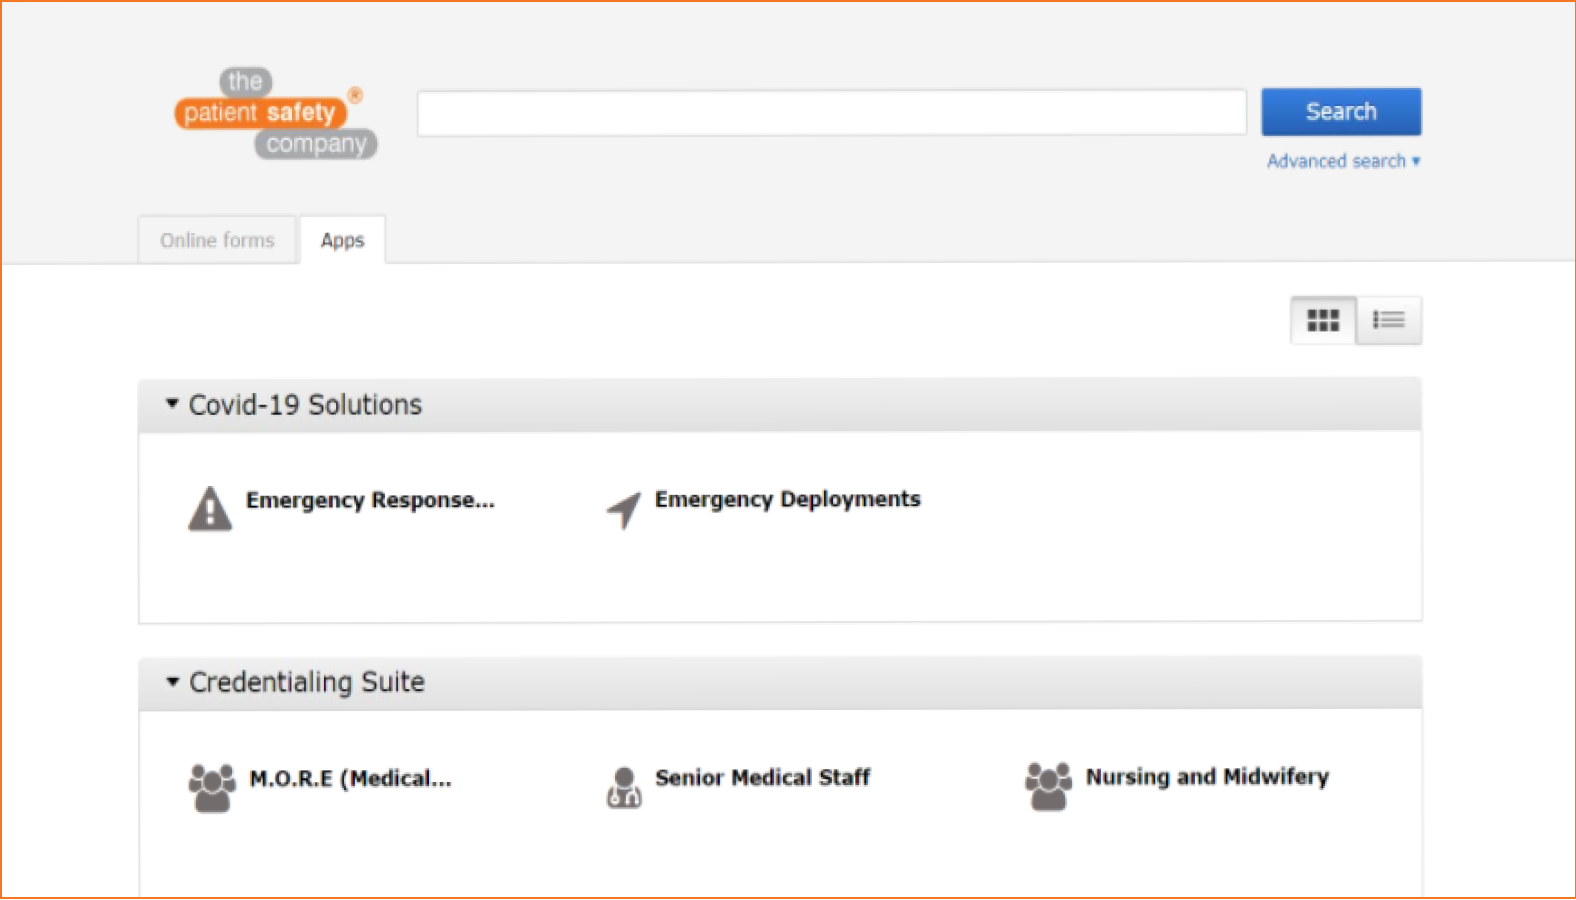 COVID-19 Crisis Response application